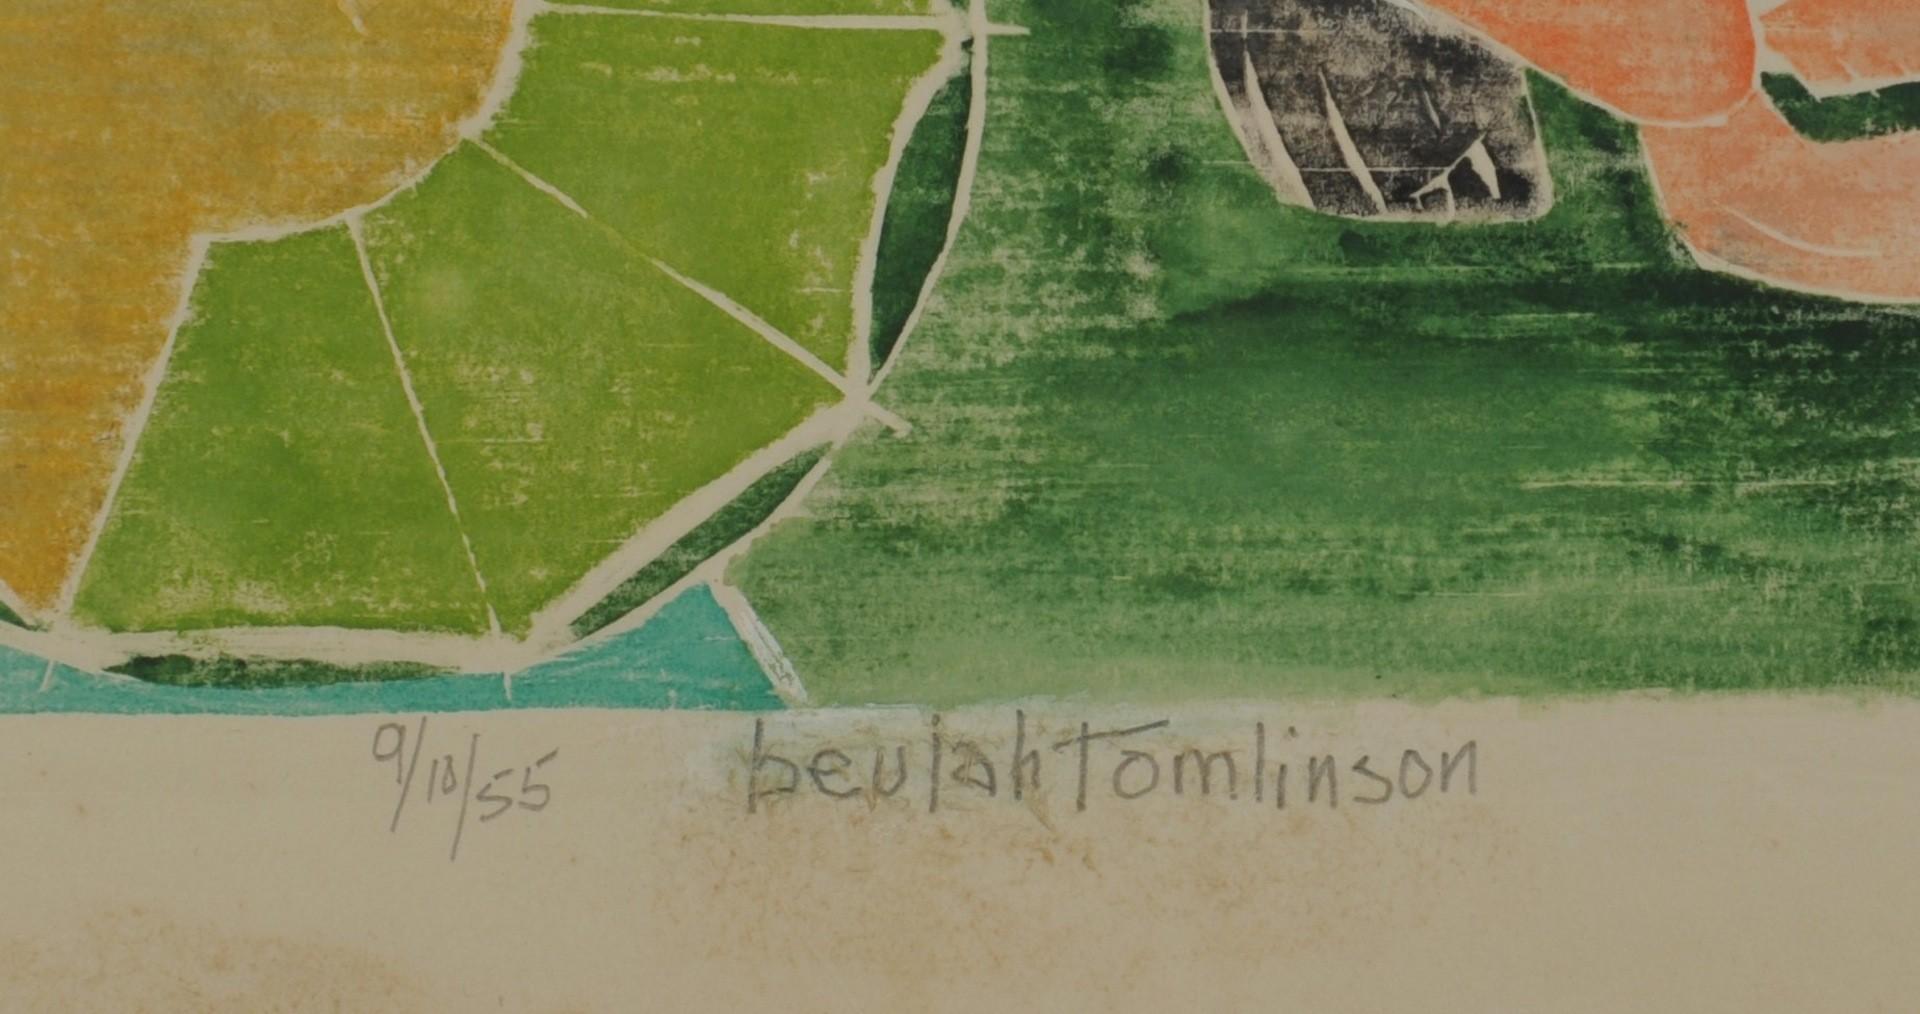 Lot __ Inv. #4181: 2 Beulah Tomlinson Wood Cut Block Prints: Bird and Crouching Nude